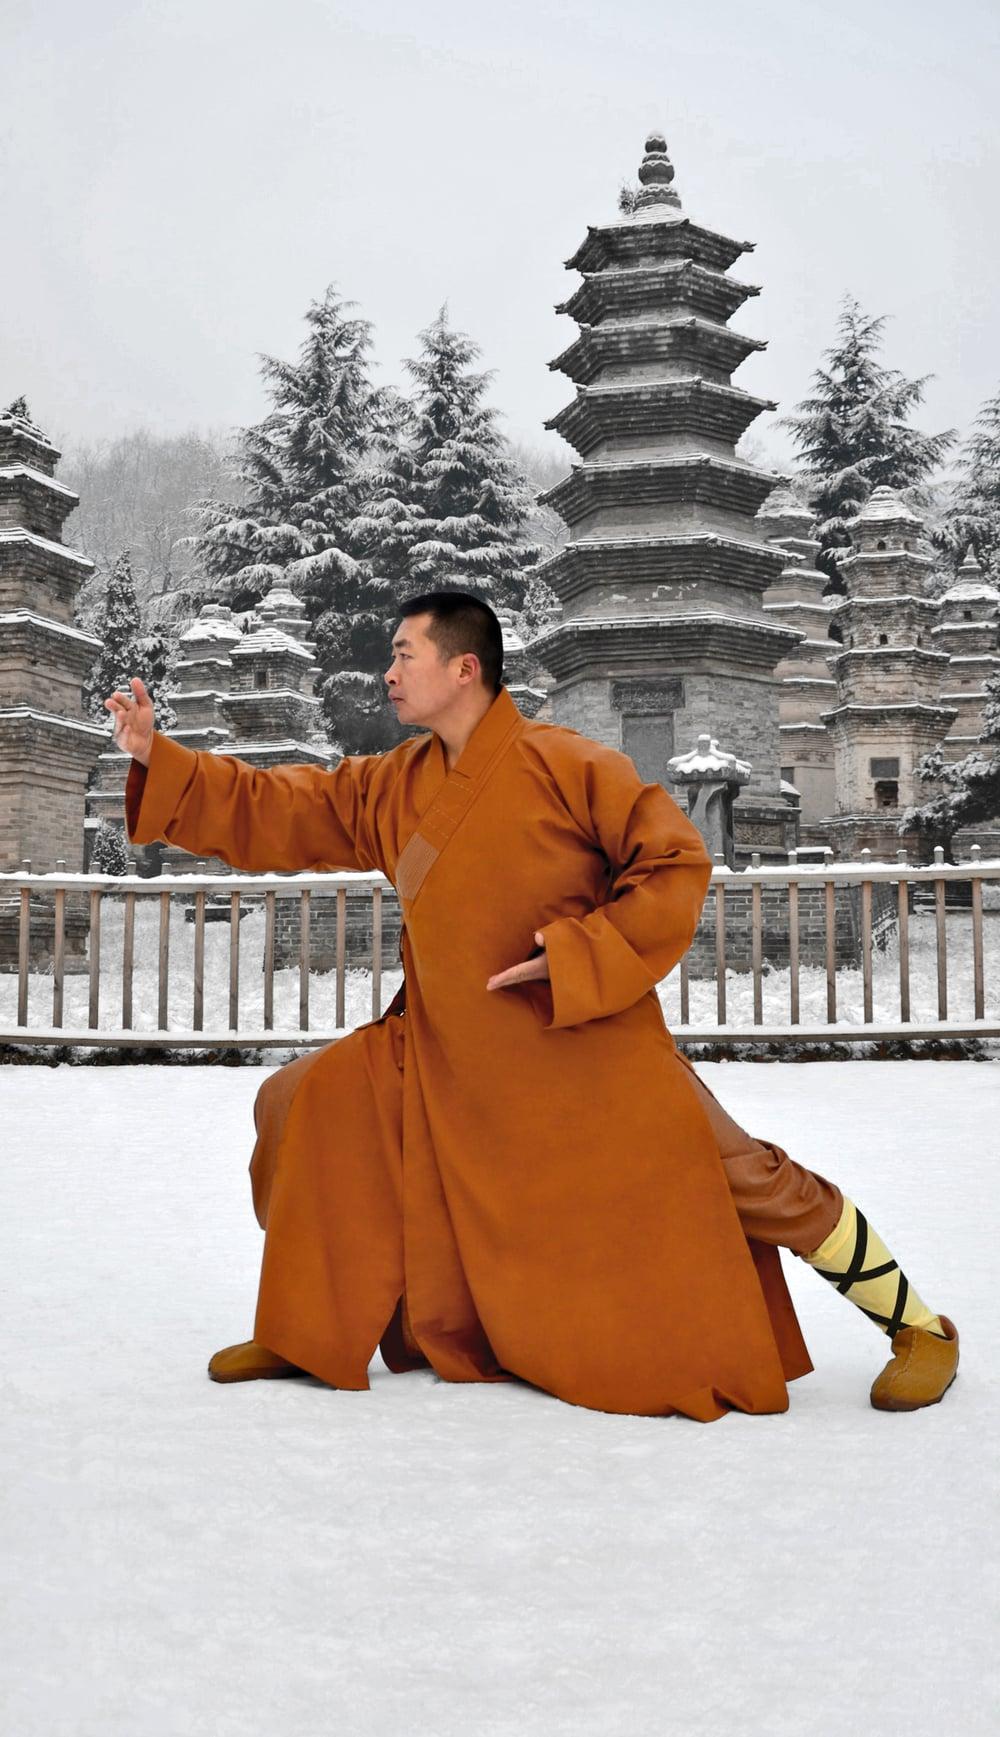 Shaolin Culture Shifu Yang Shaolin Temple